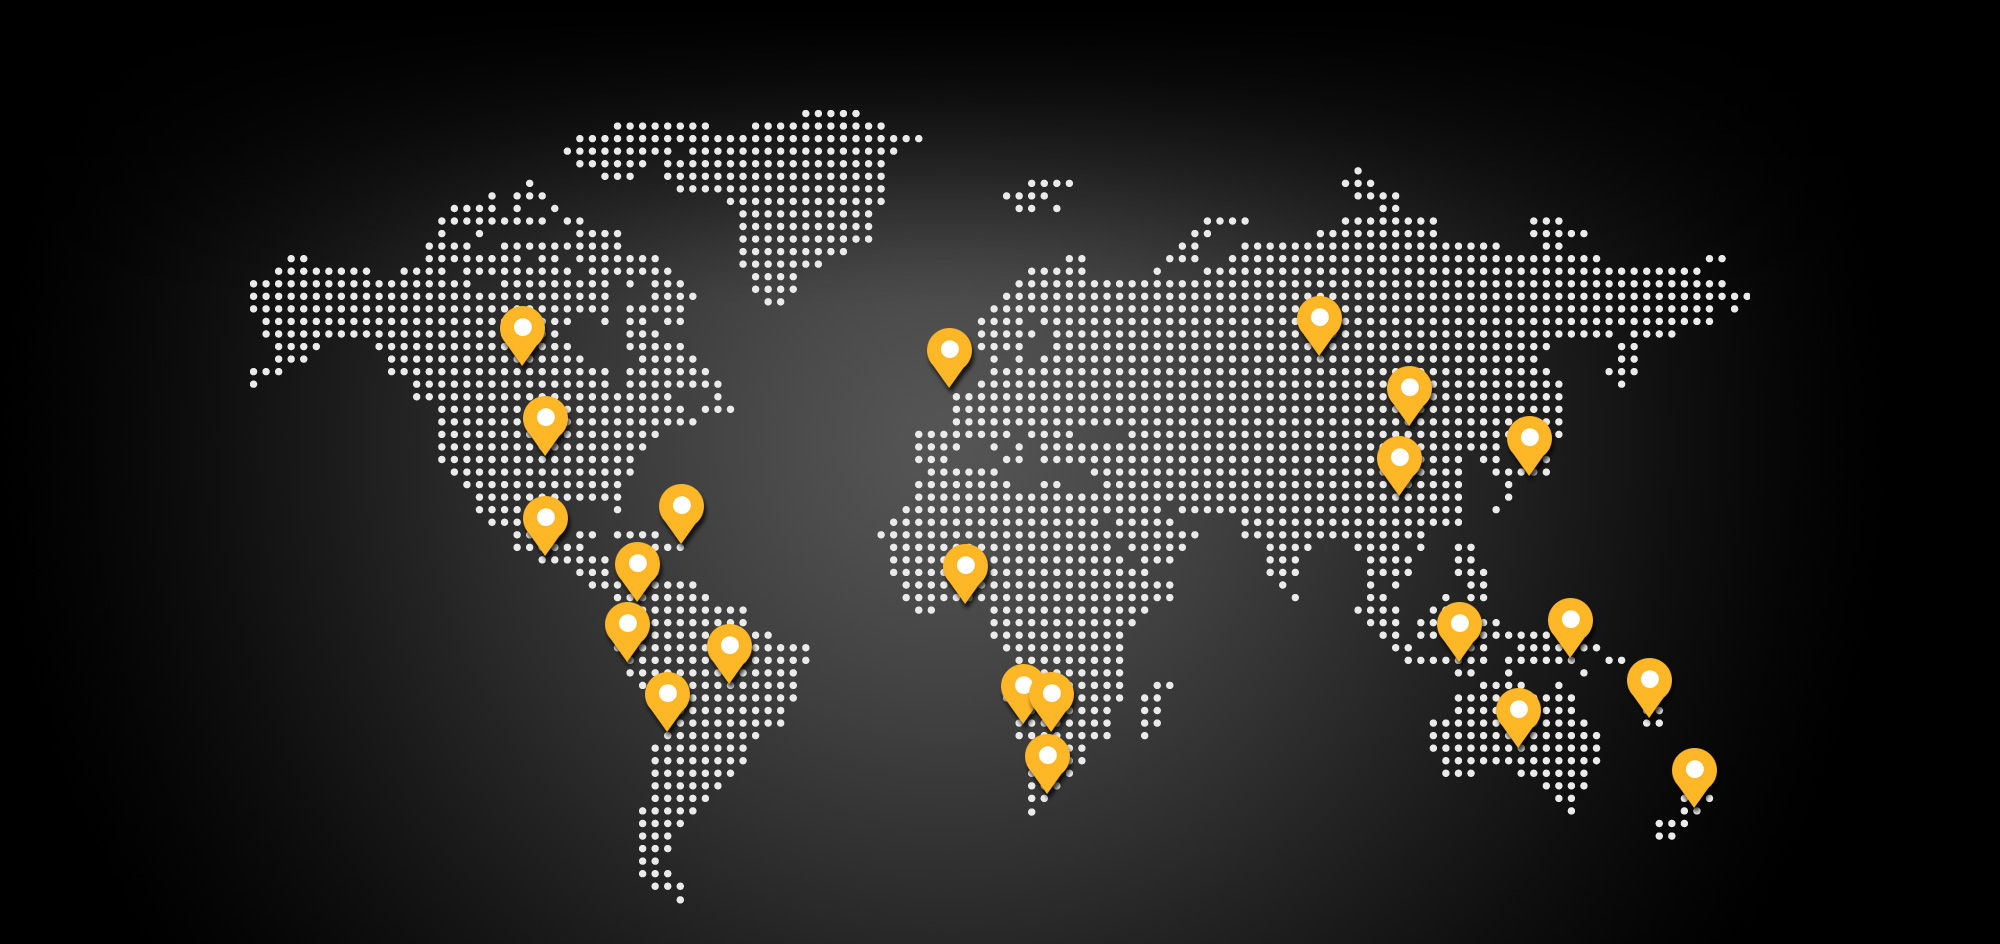 EDMO mining jacks worldwide locations